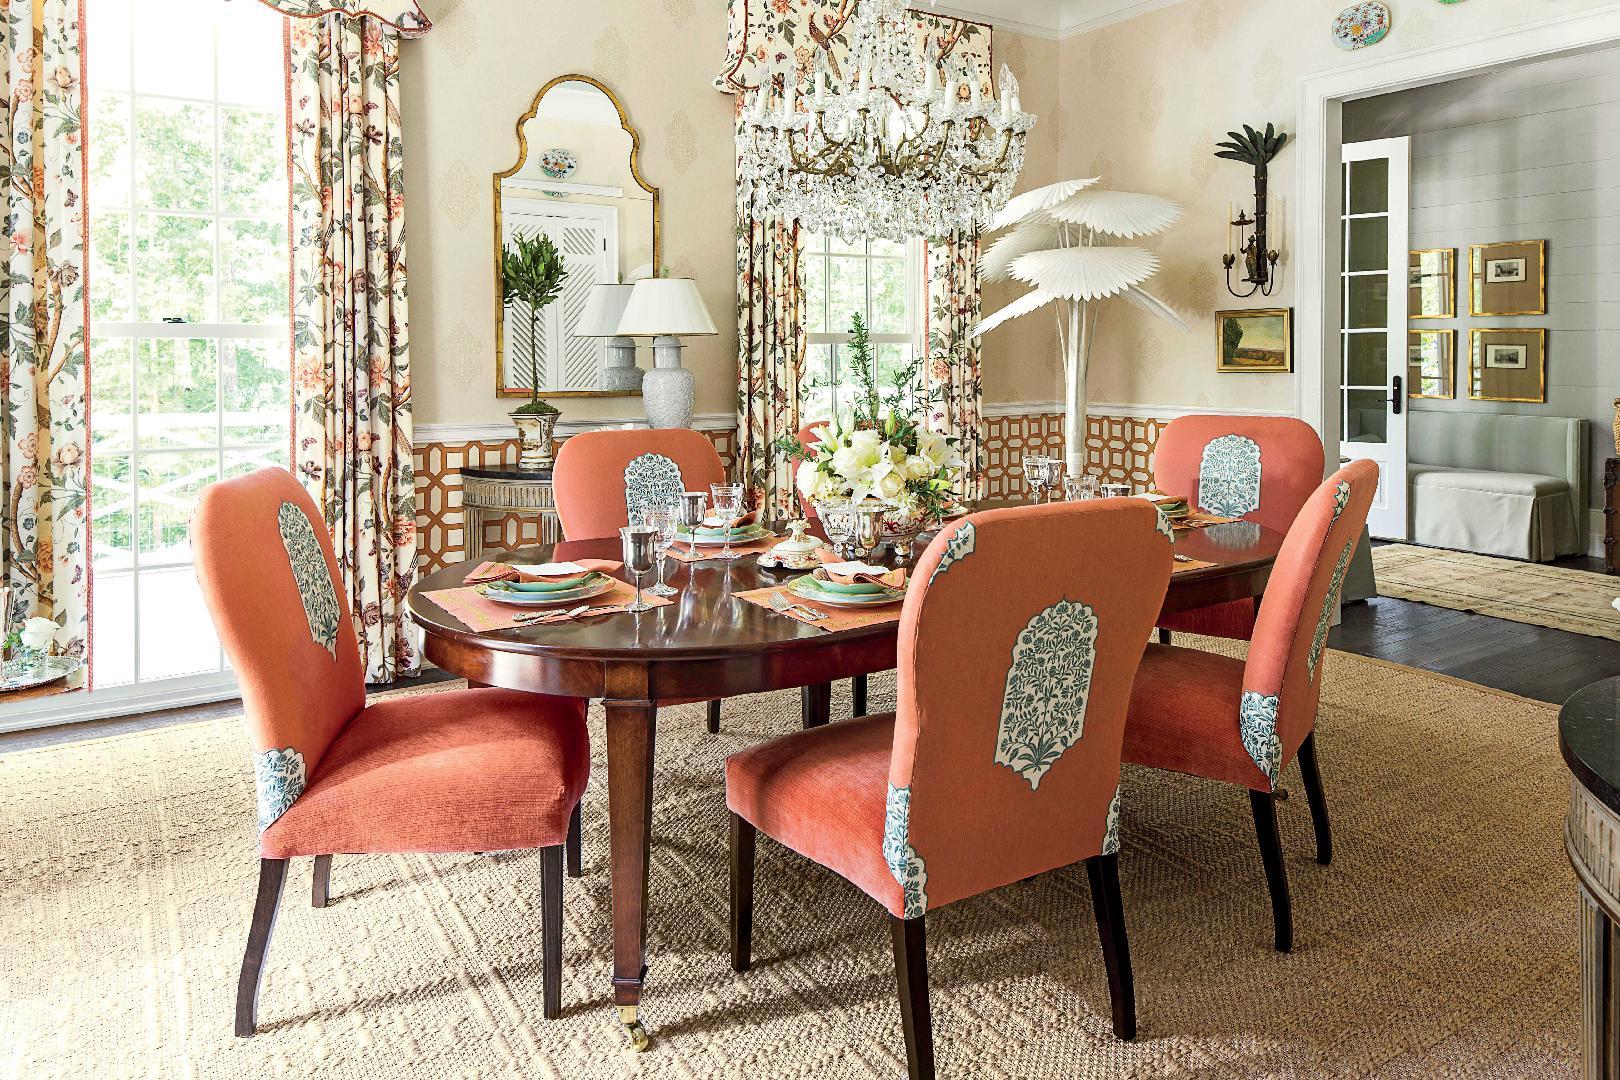 2016 Idea House: The Dining Room